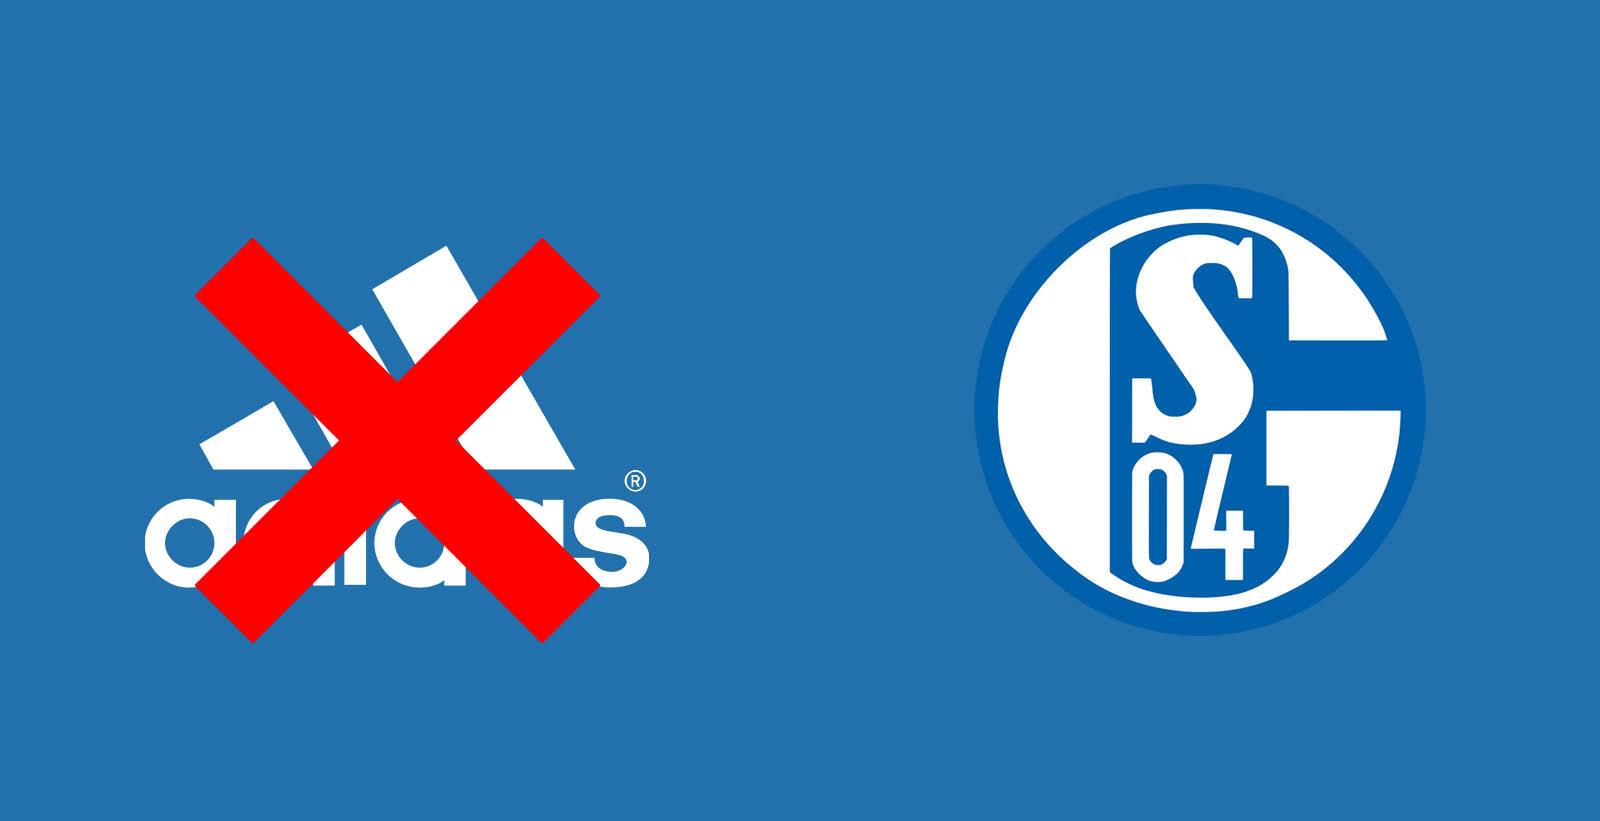 119f7f5a4 Clearance Schalke 04 To End Adidas Partnership